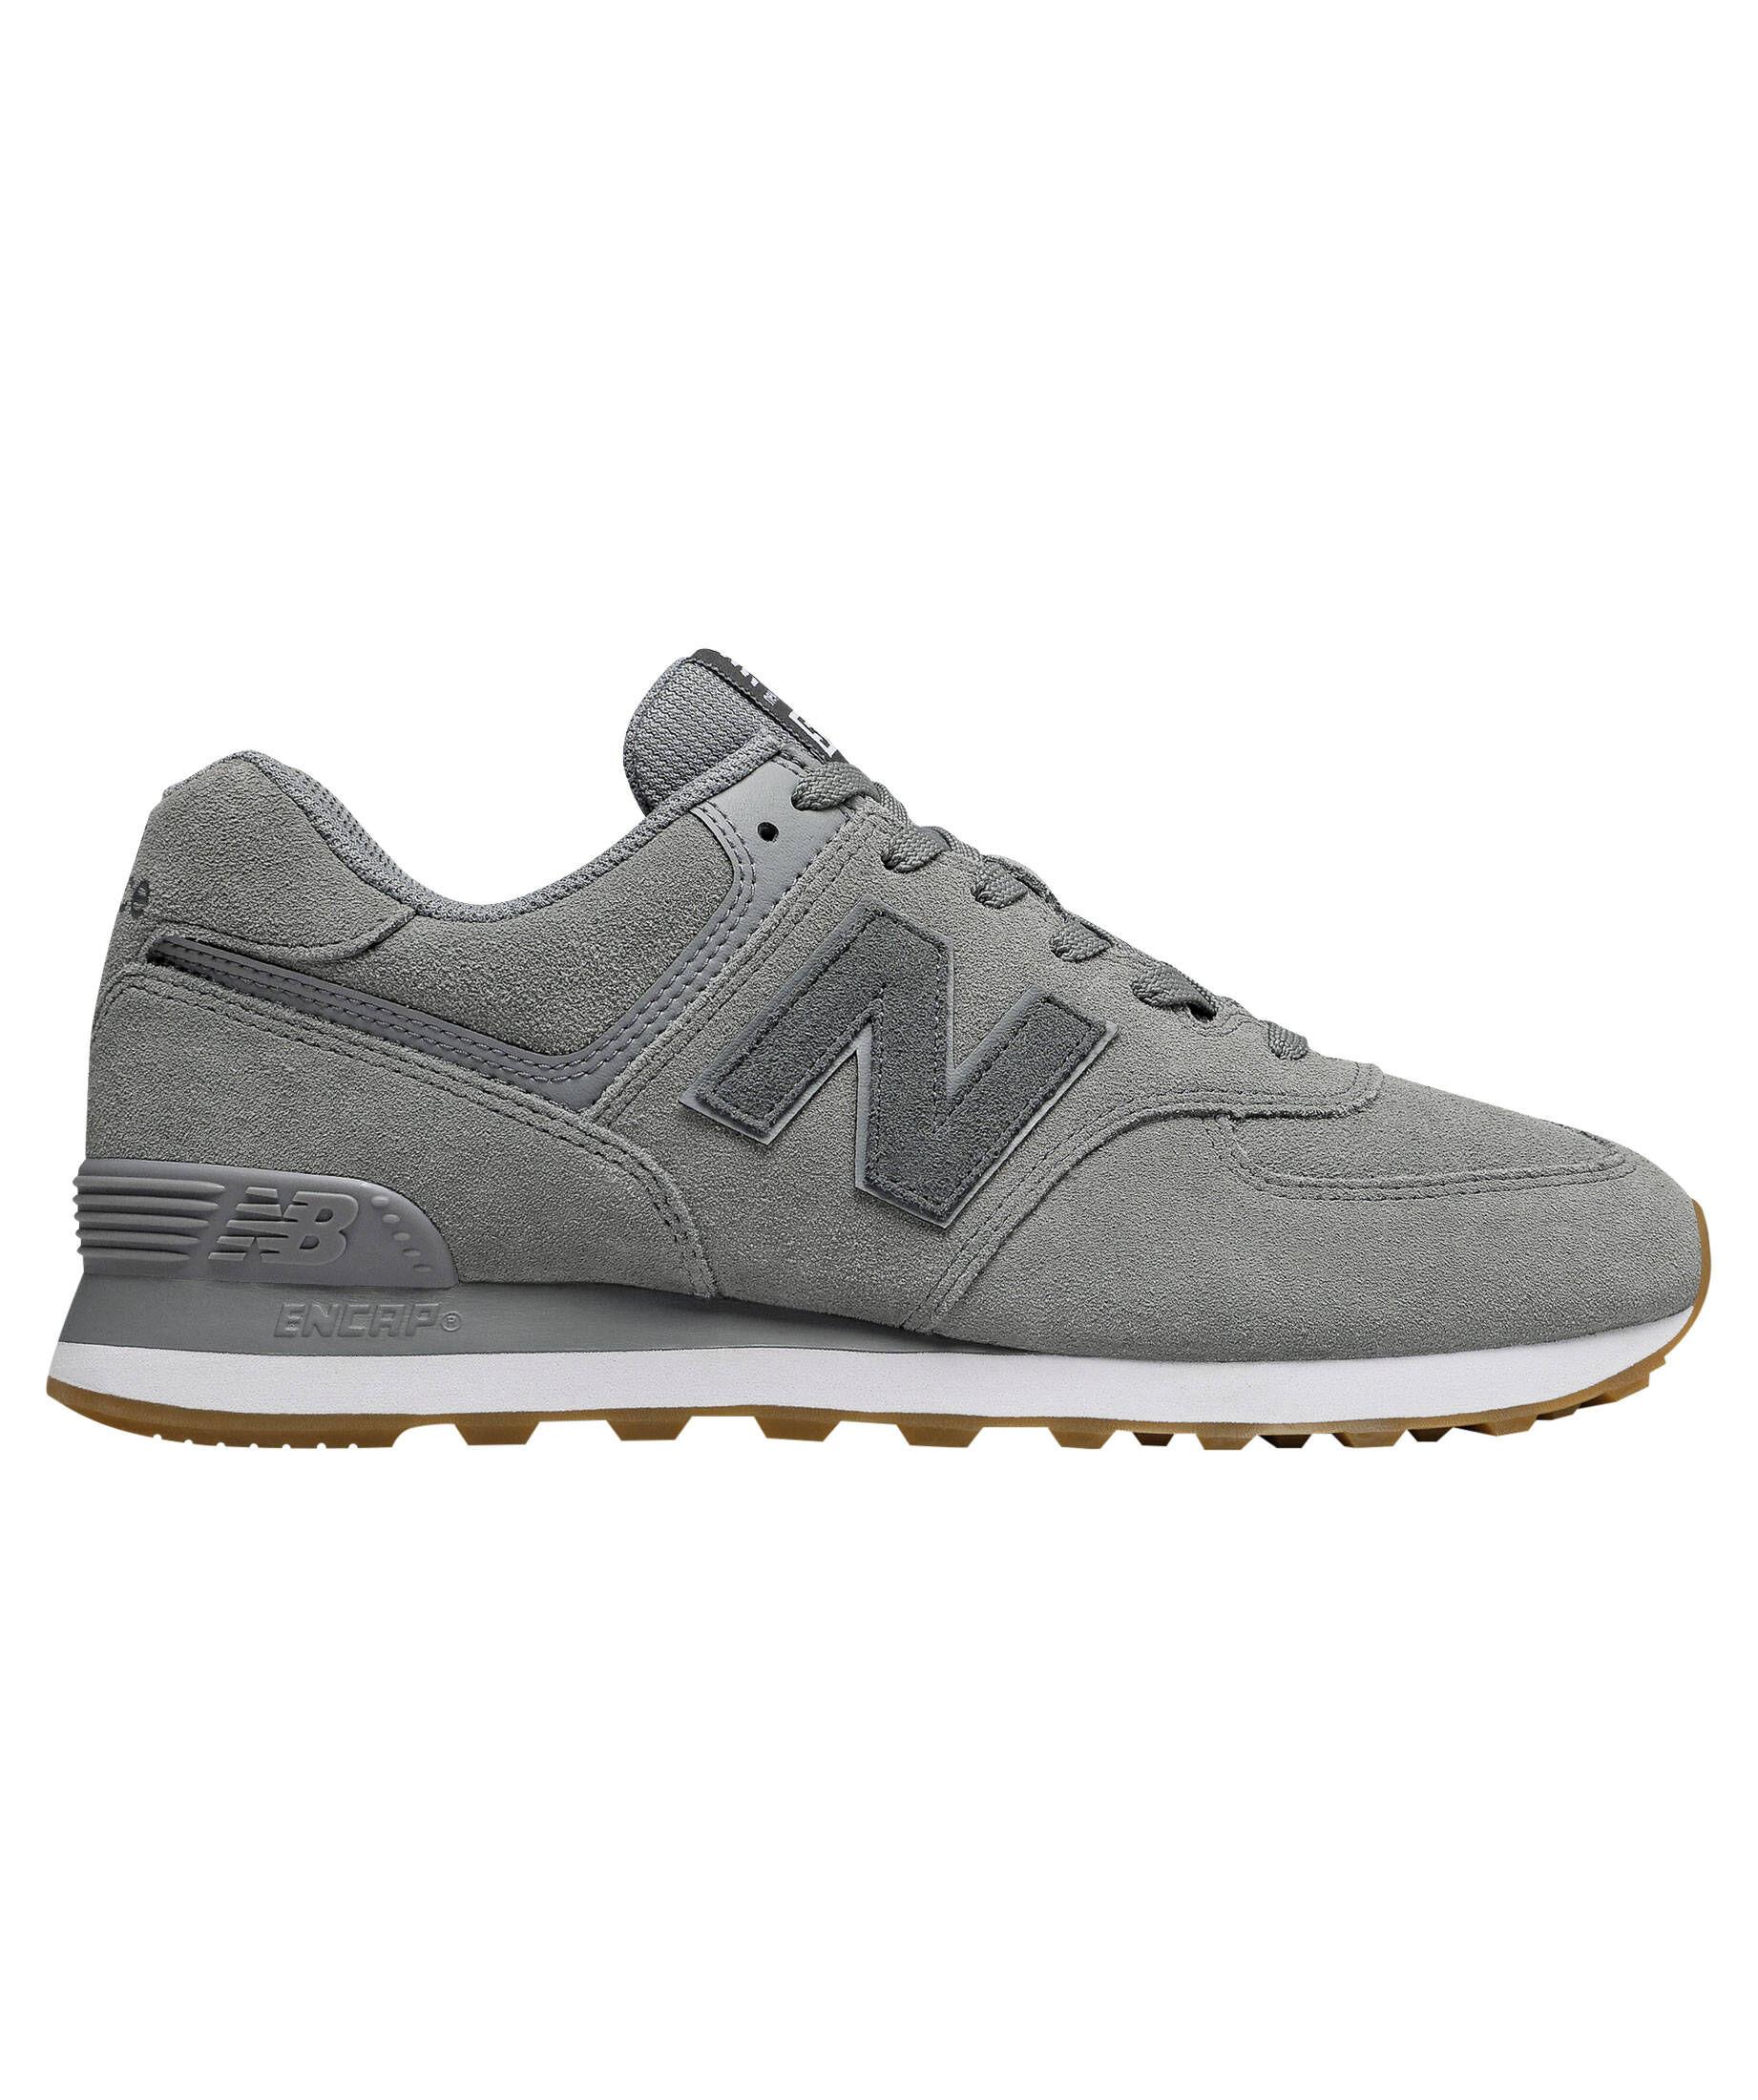 Balance Turnschuhe Sneaker Schuhe Trend Schuhe Herren Grau